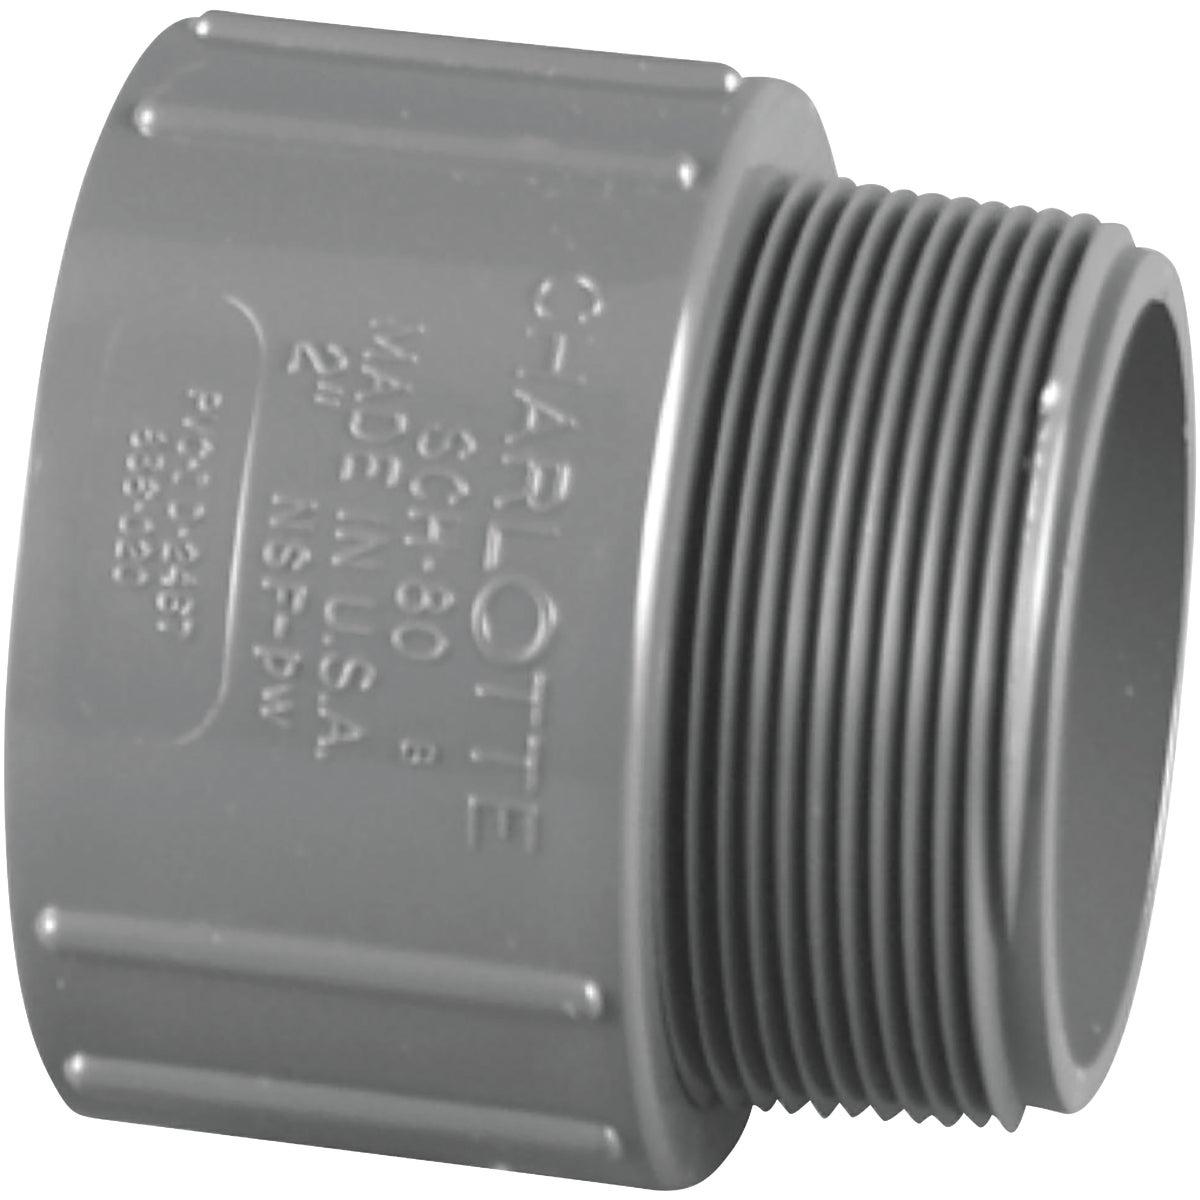 1-1/2 SCH80 MALE ADAPTER - 304158 by Genova Inc